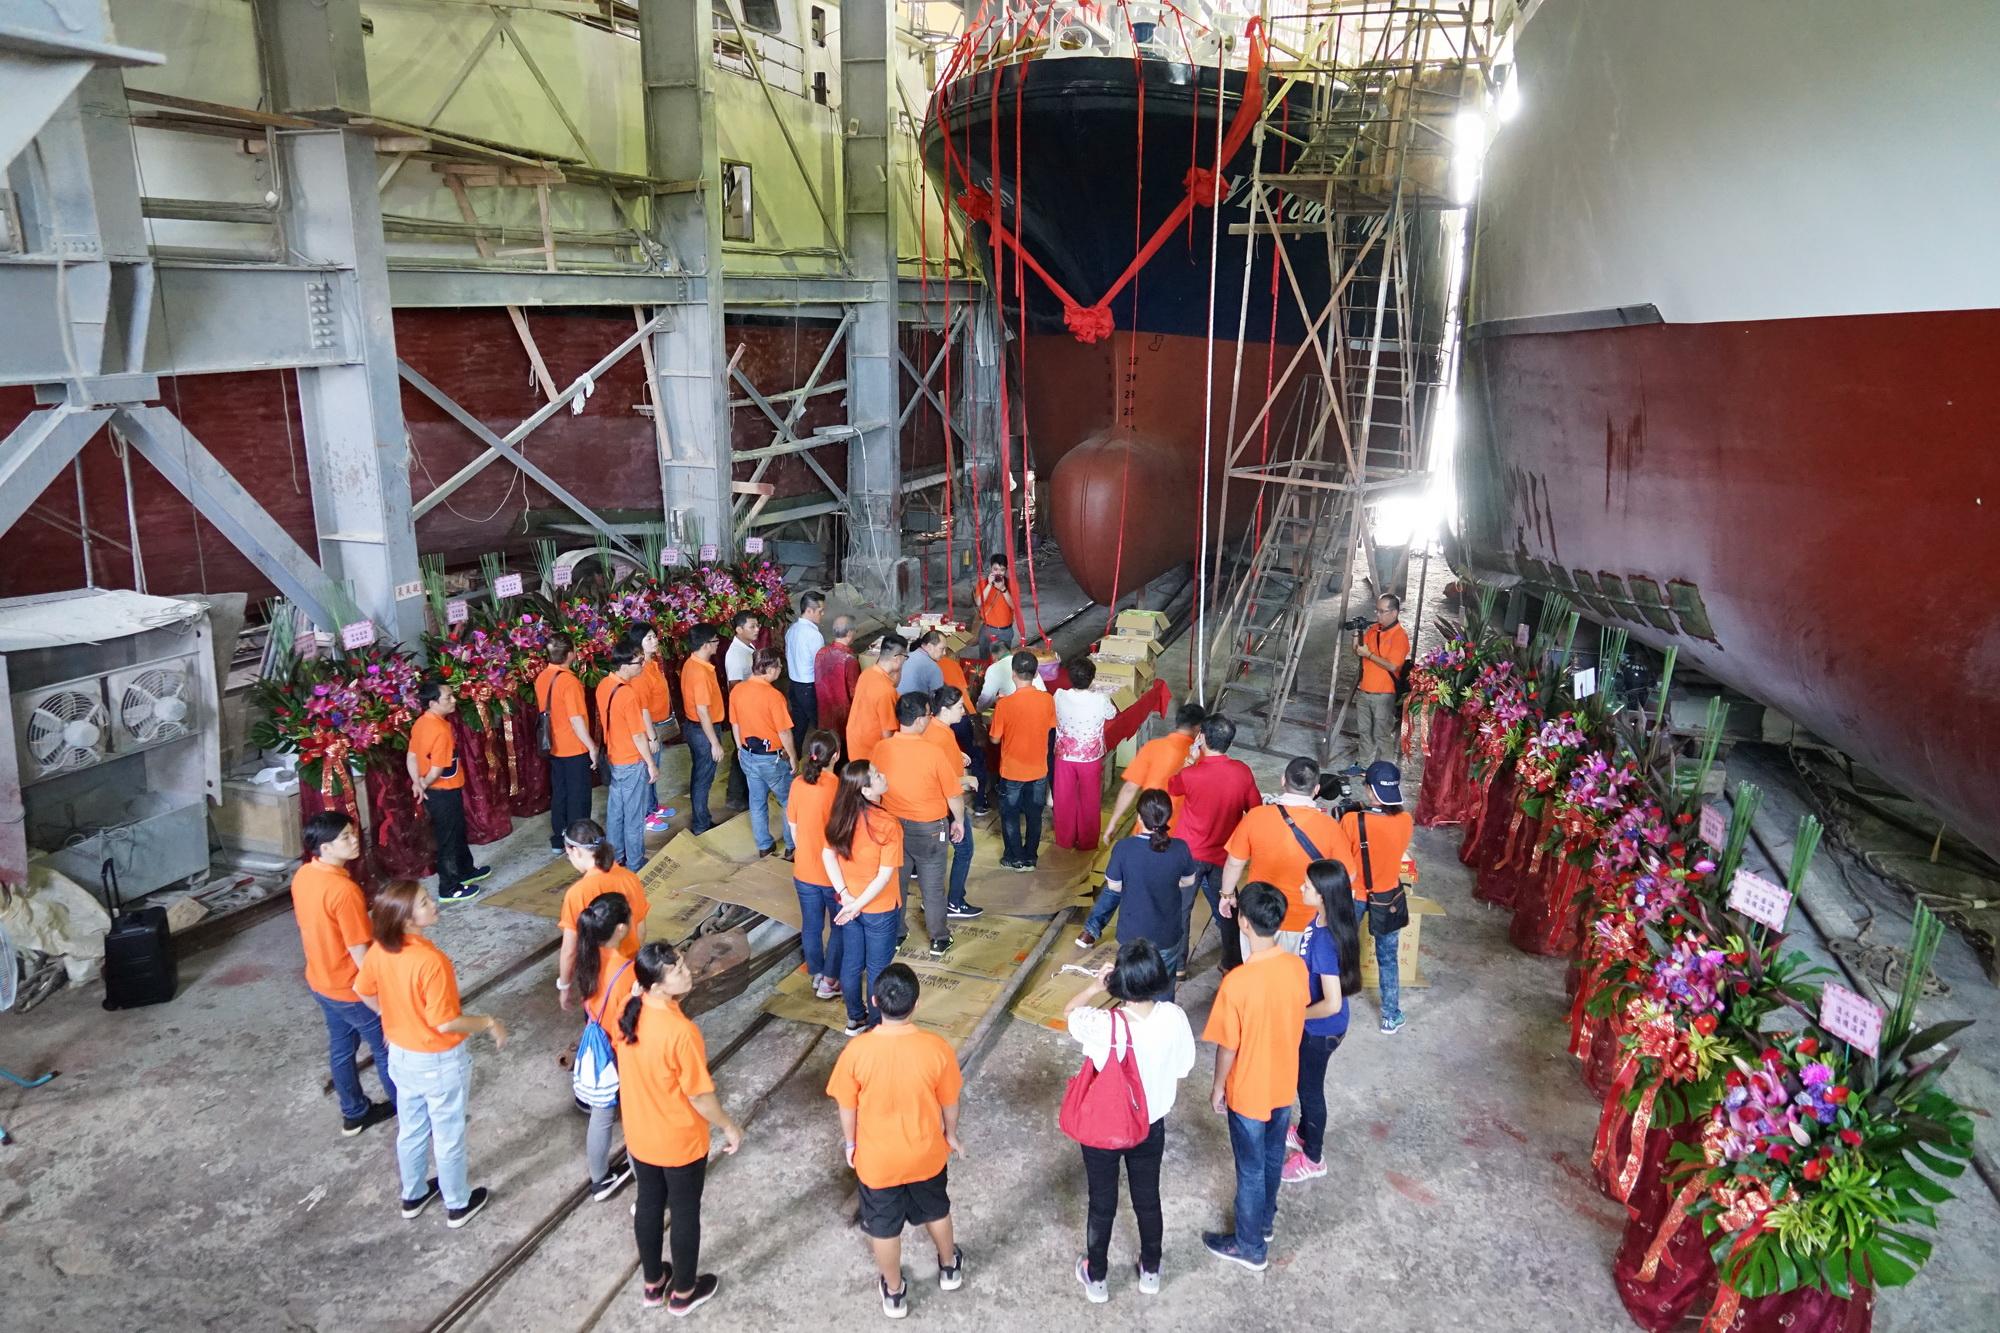 Pdc Hsing Sheng Hwa Co., Ltd. - panjiva.com